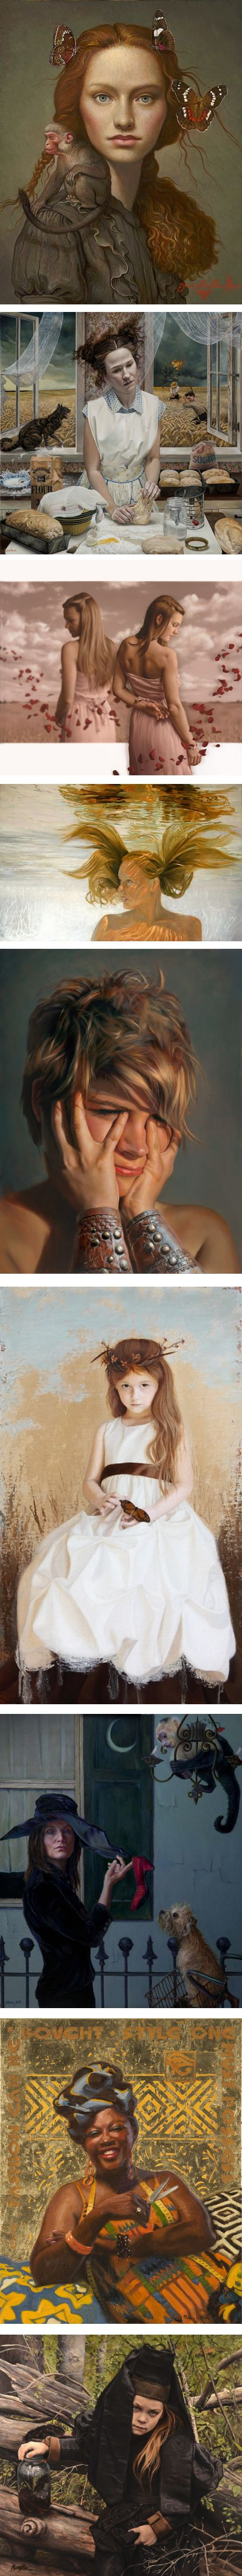 Women Painting Women, RJD Gallery 2015: Whalen, Rebecca Tait, Nancy Boren, Pamela Wilson